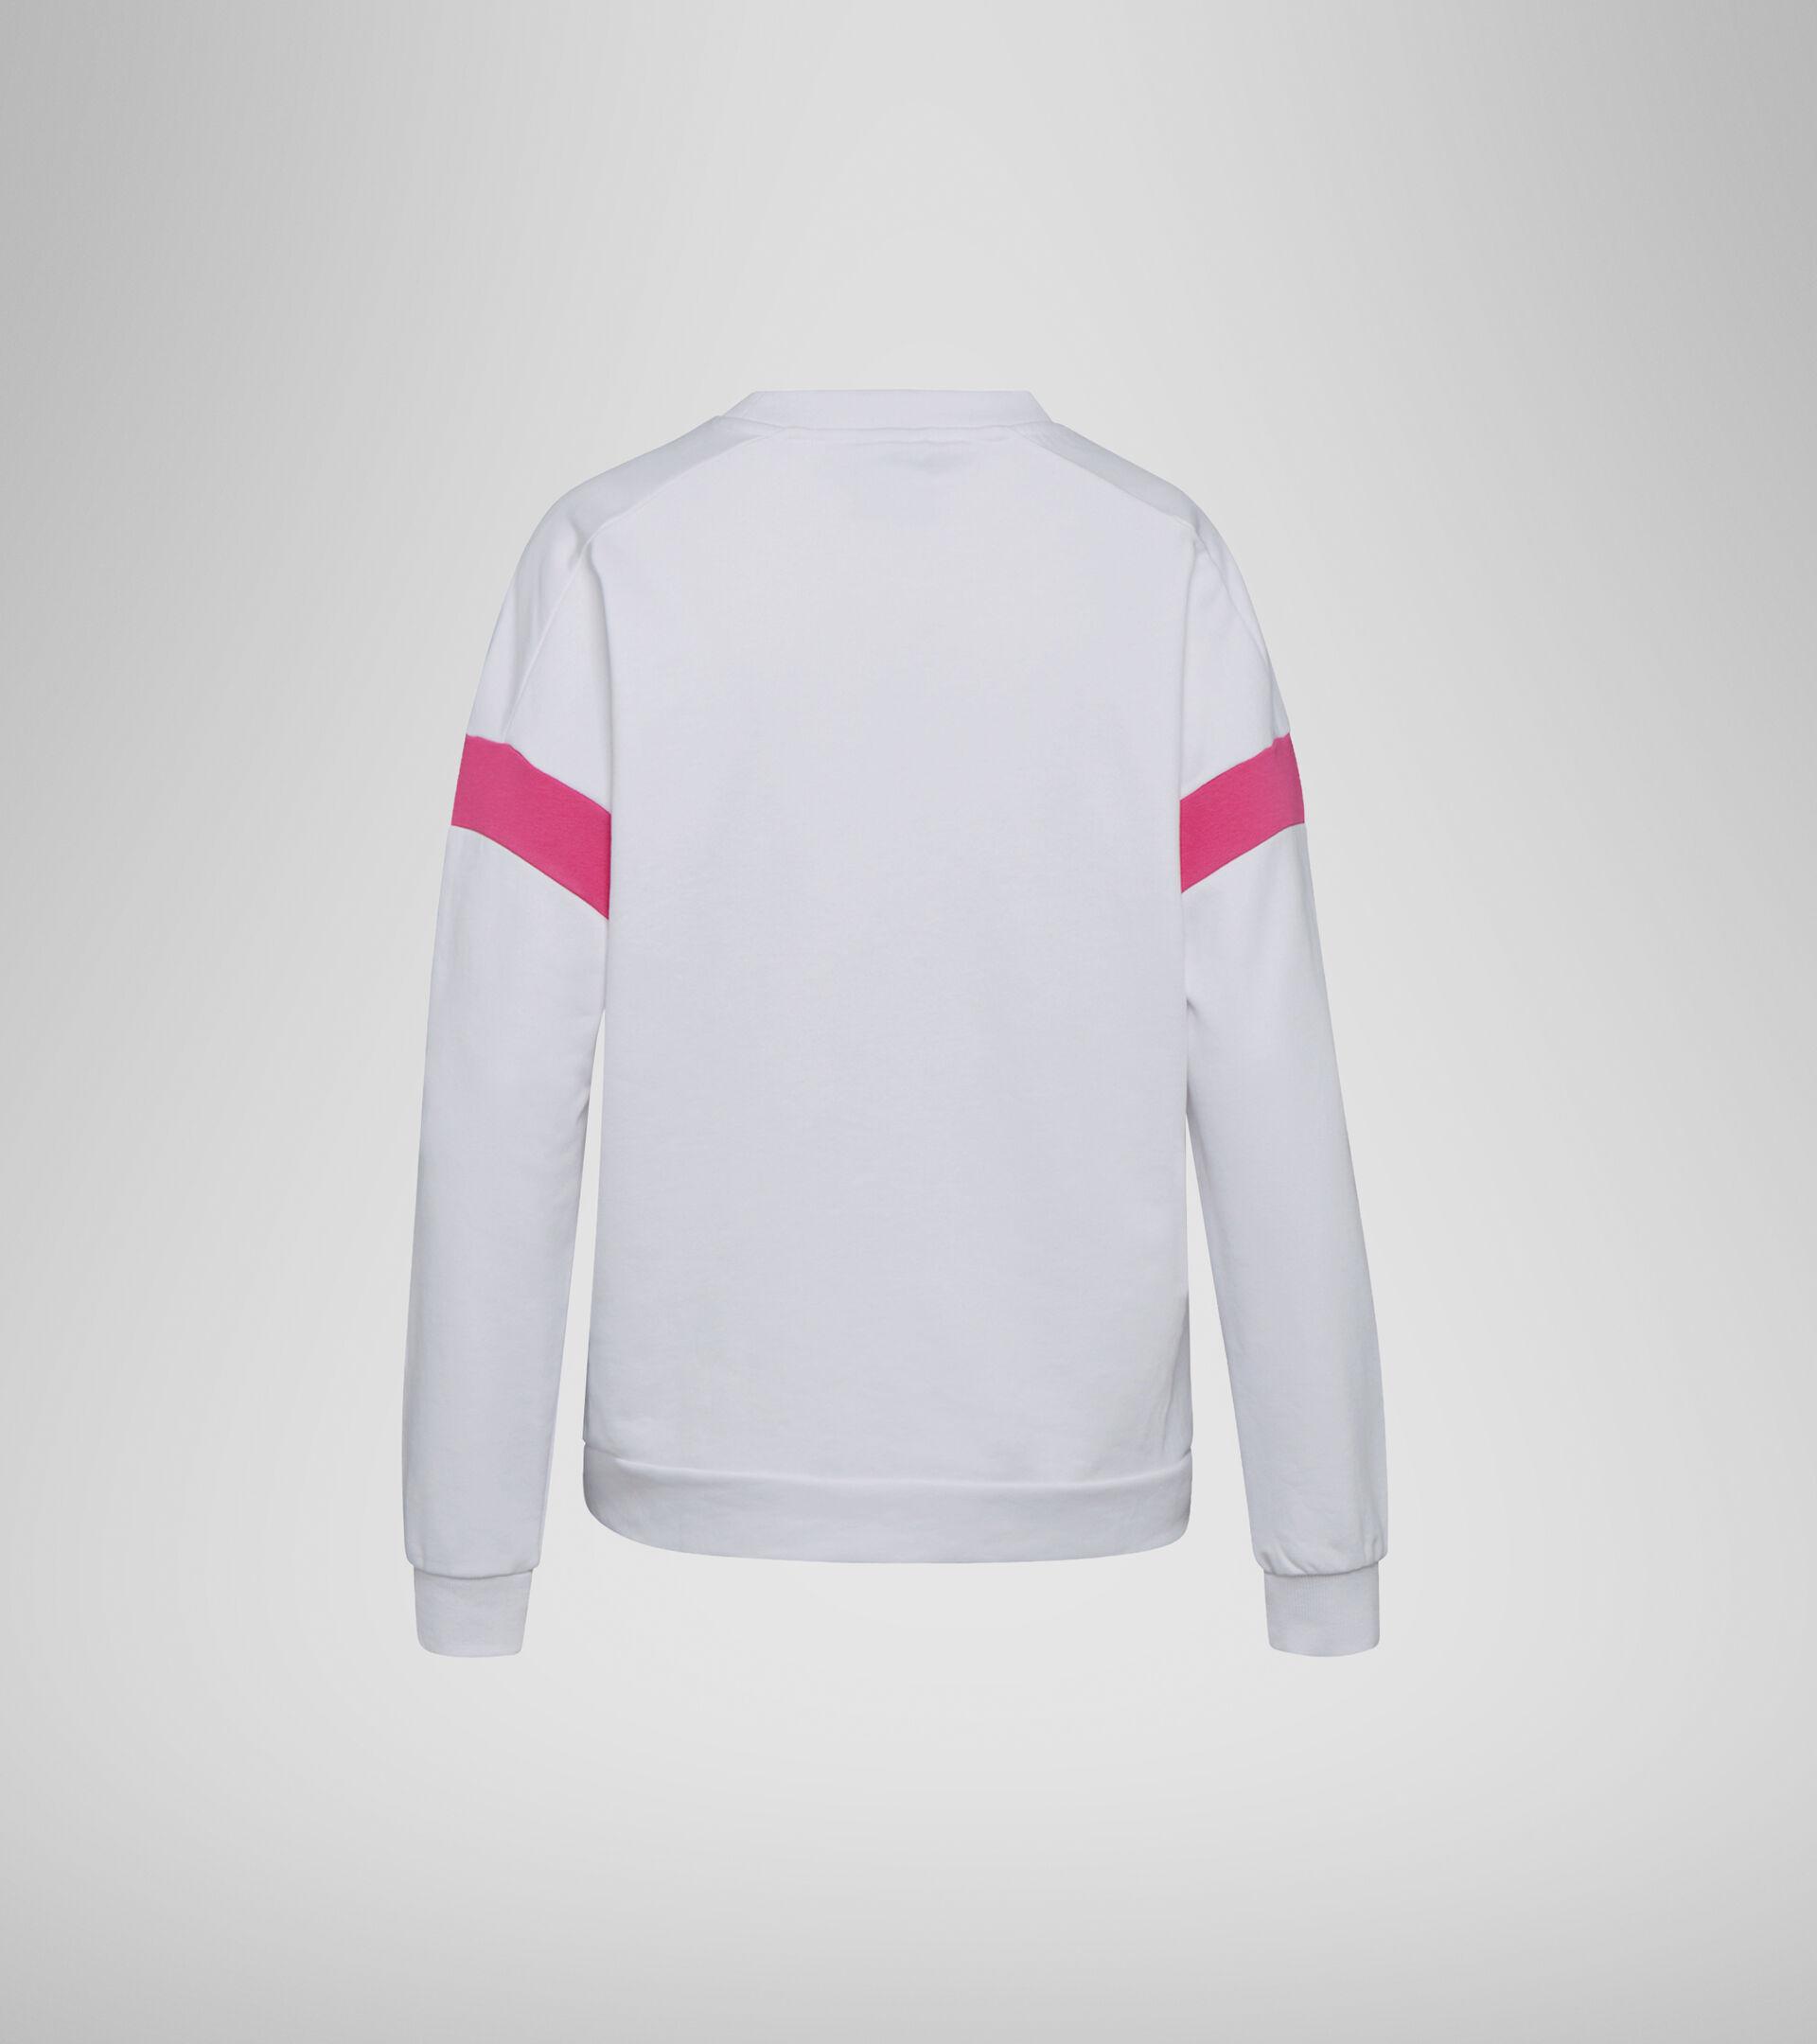 Apparel Sport DONNA L.SWEATSHIRT CREW SPOTLIGHT BLANCO VIVO Diadora